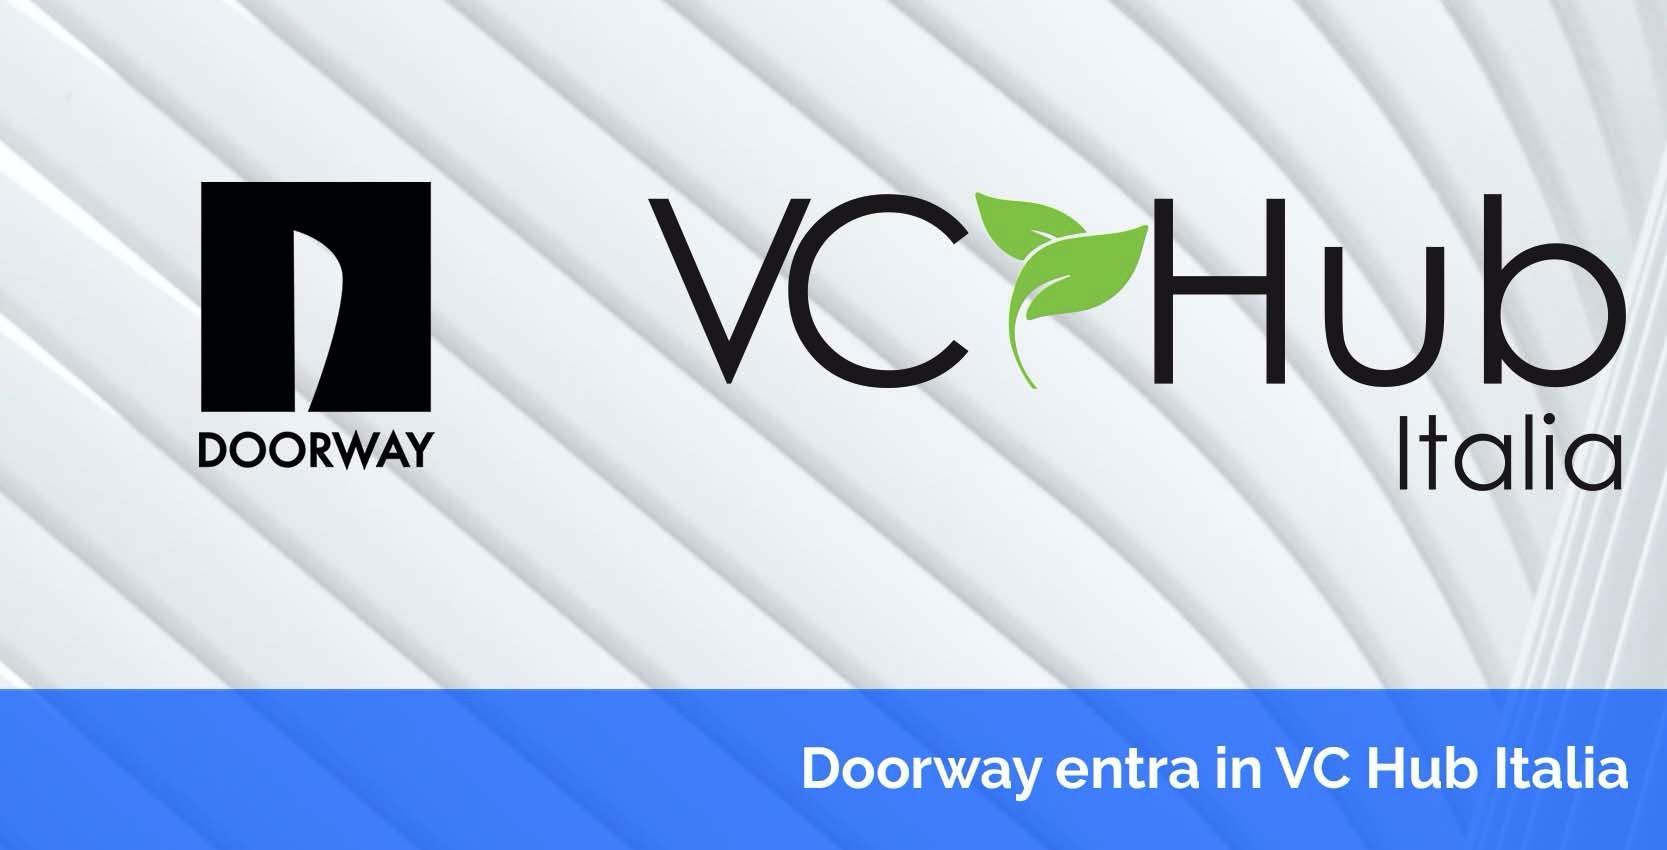 Doorway entra in VC Hub Italia